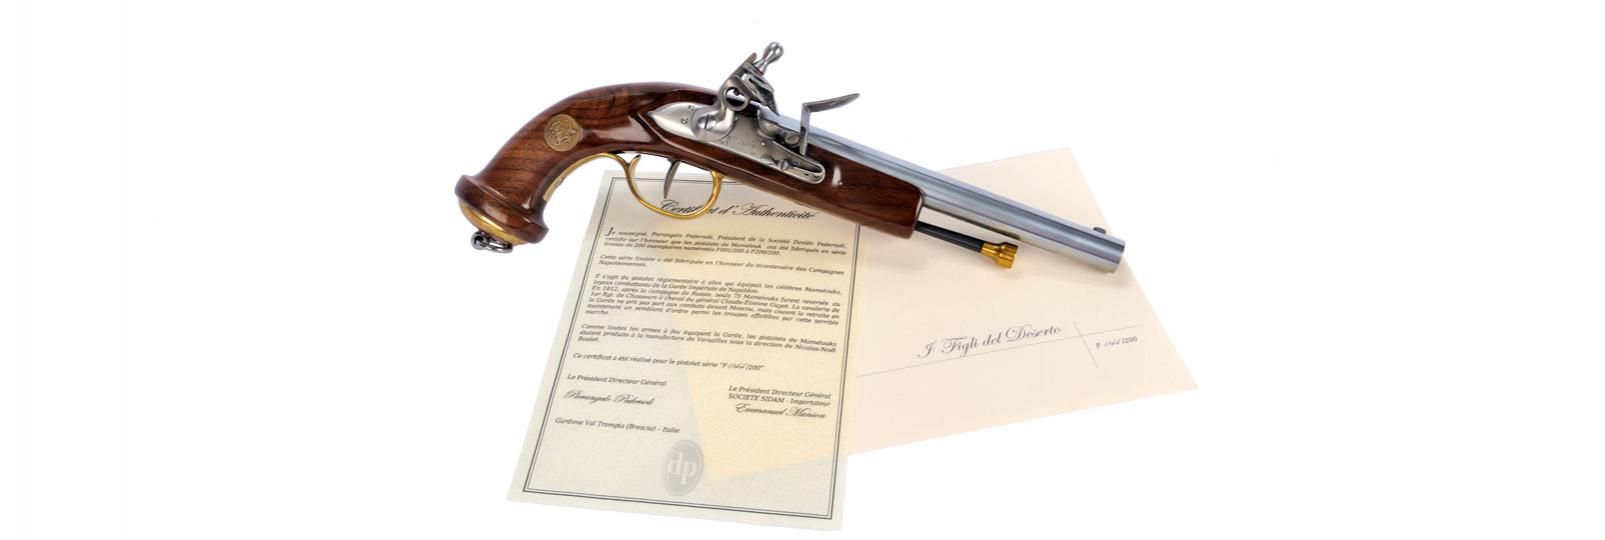 Pistola Mamelouk commemorativa